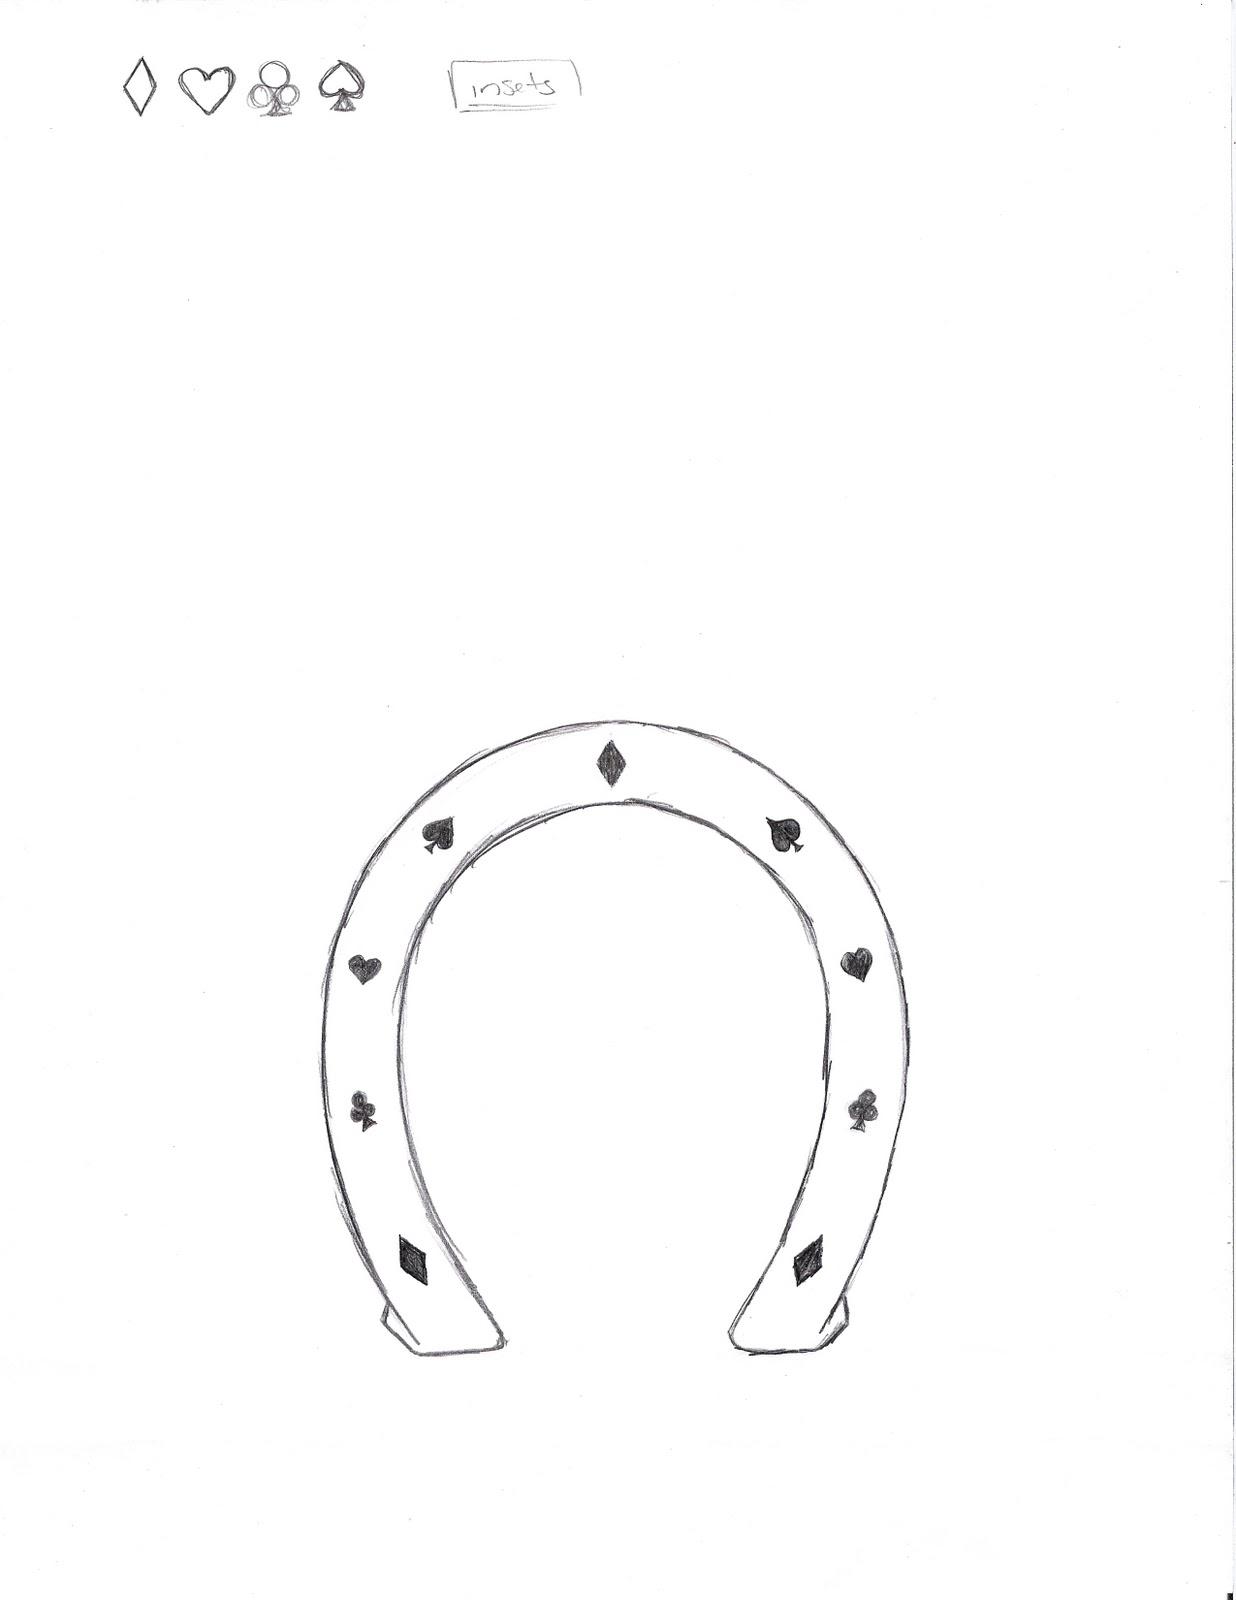 Drawn horseshoe hand Ad Photography screen design Newspaper